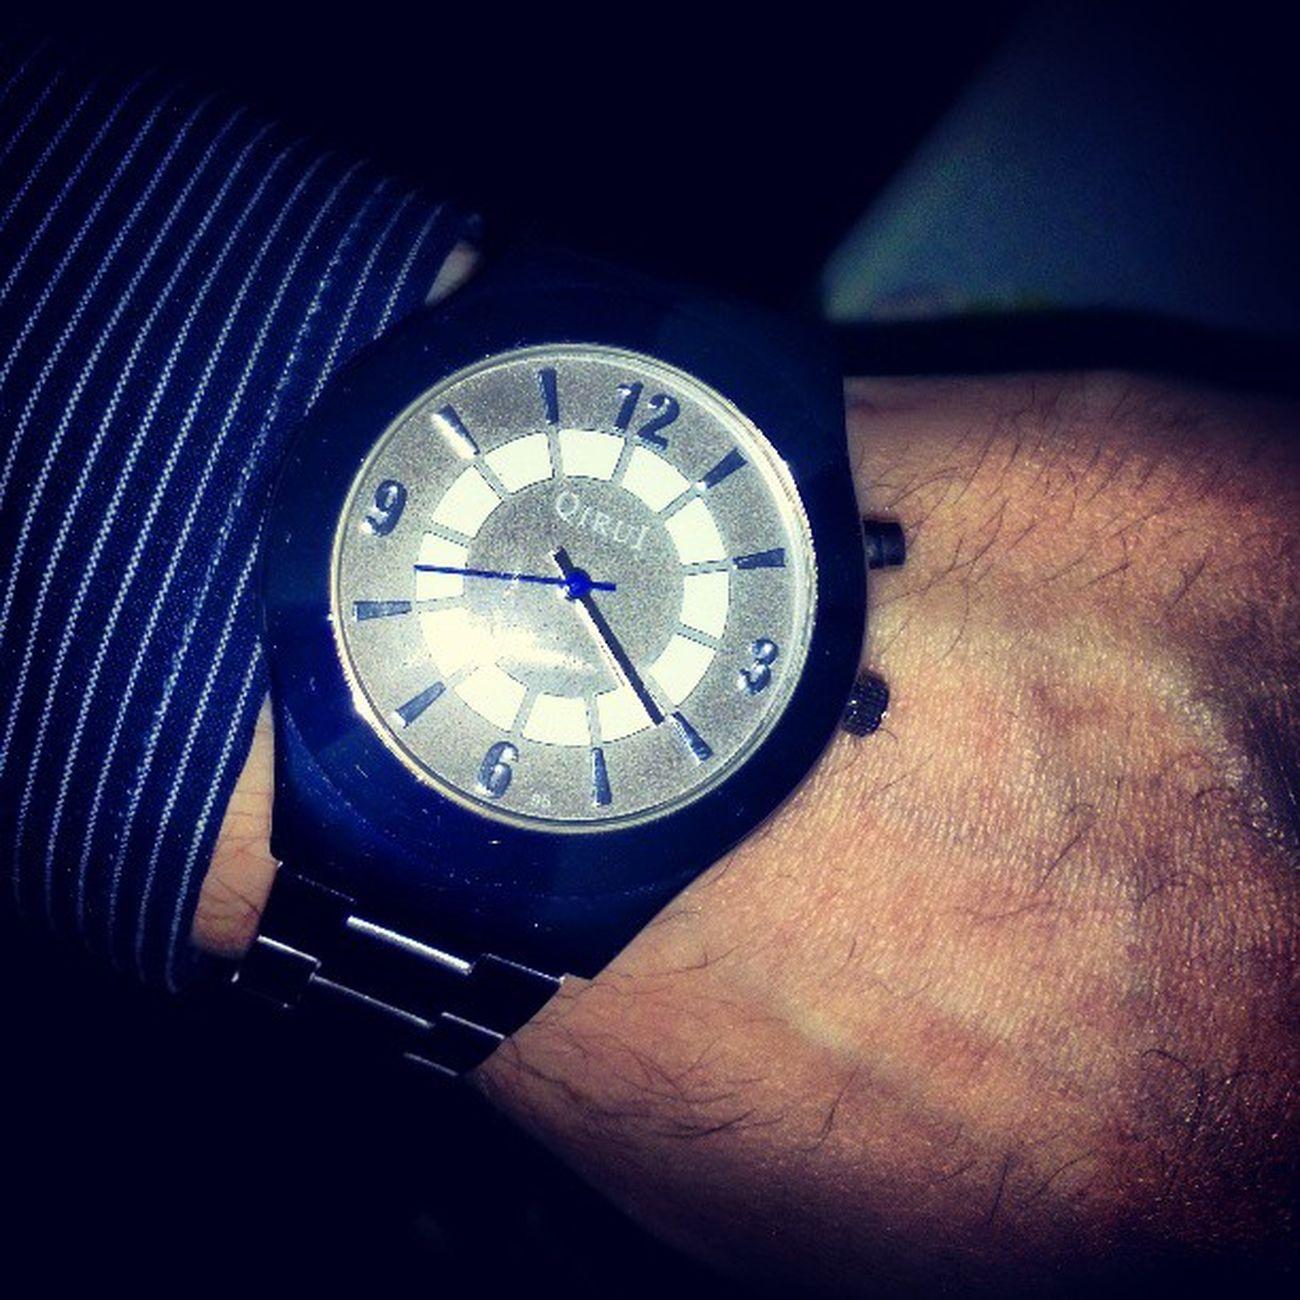 часы часики рука аксессуар вещь clock clocks time times